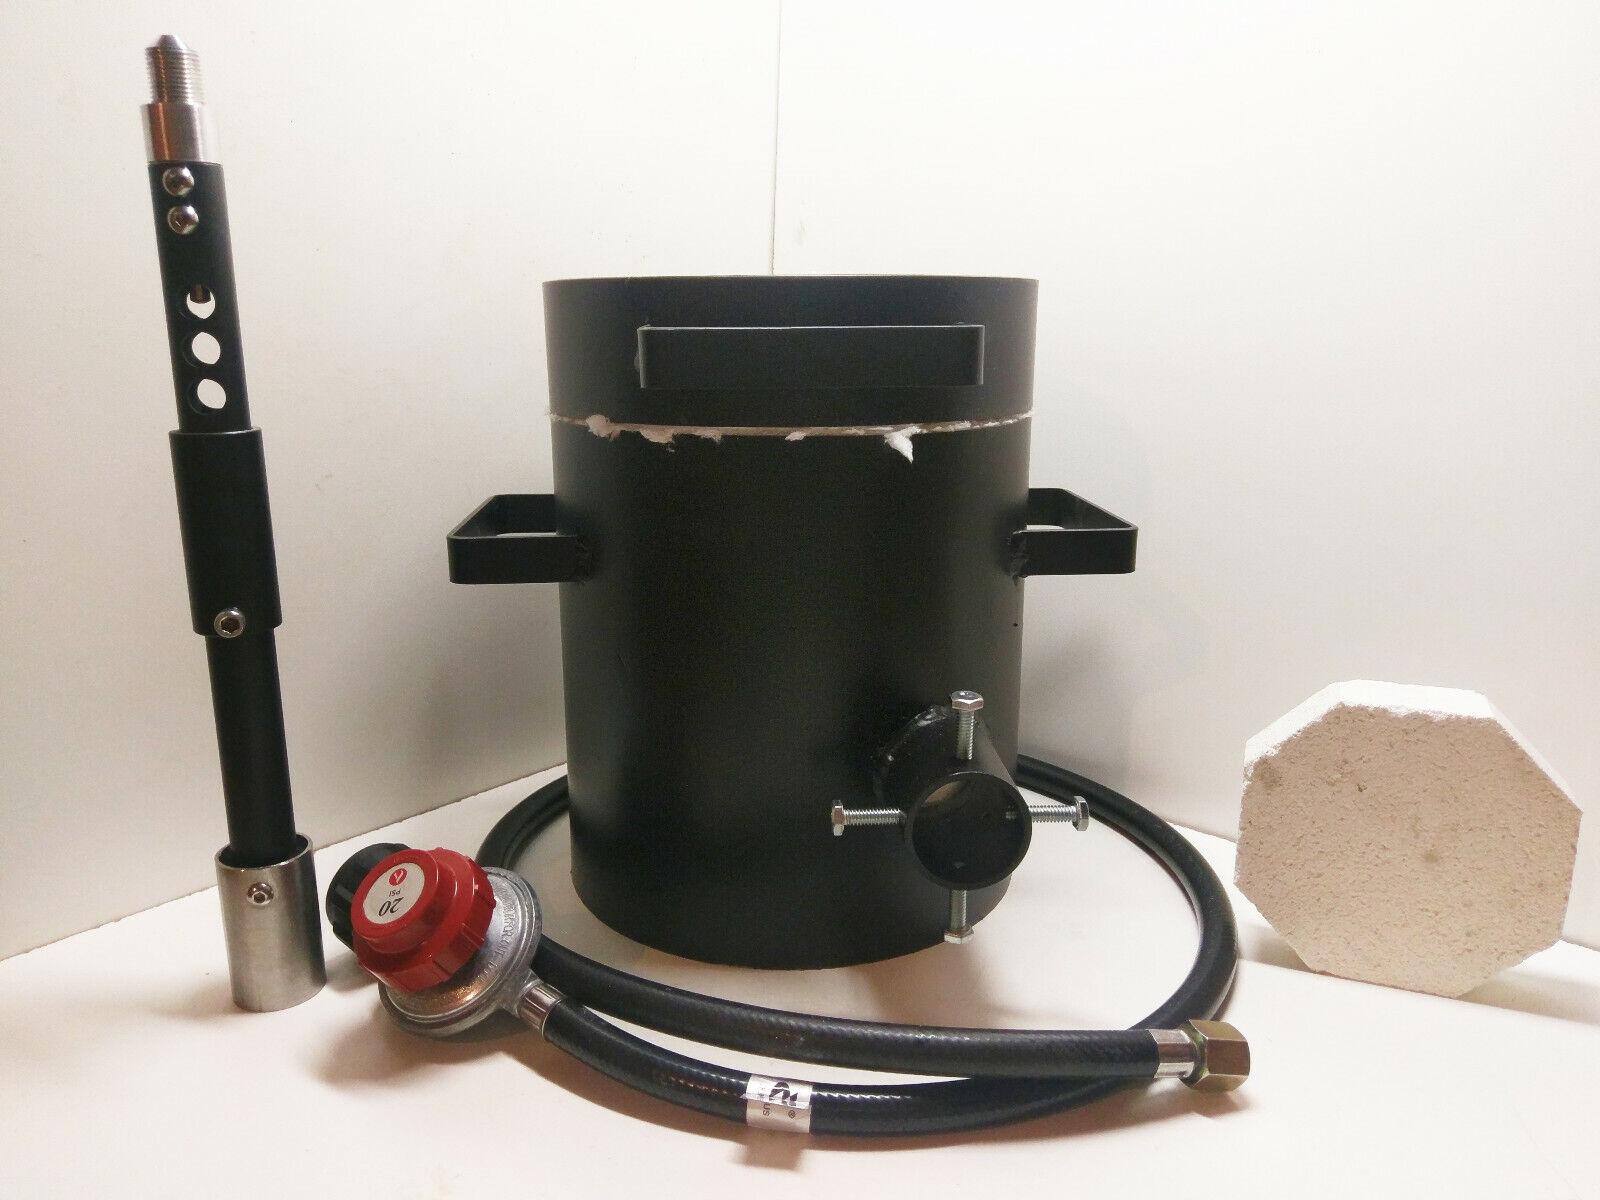 Propane Metal Casting Smelting Furnace/ Forge Kiln 4kg Melti